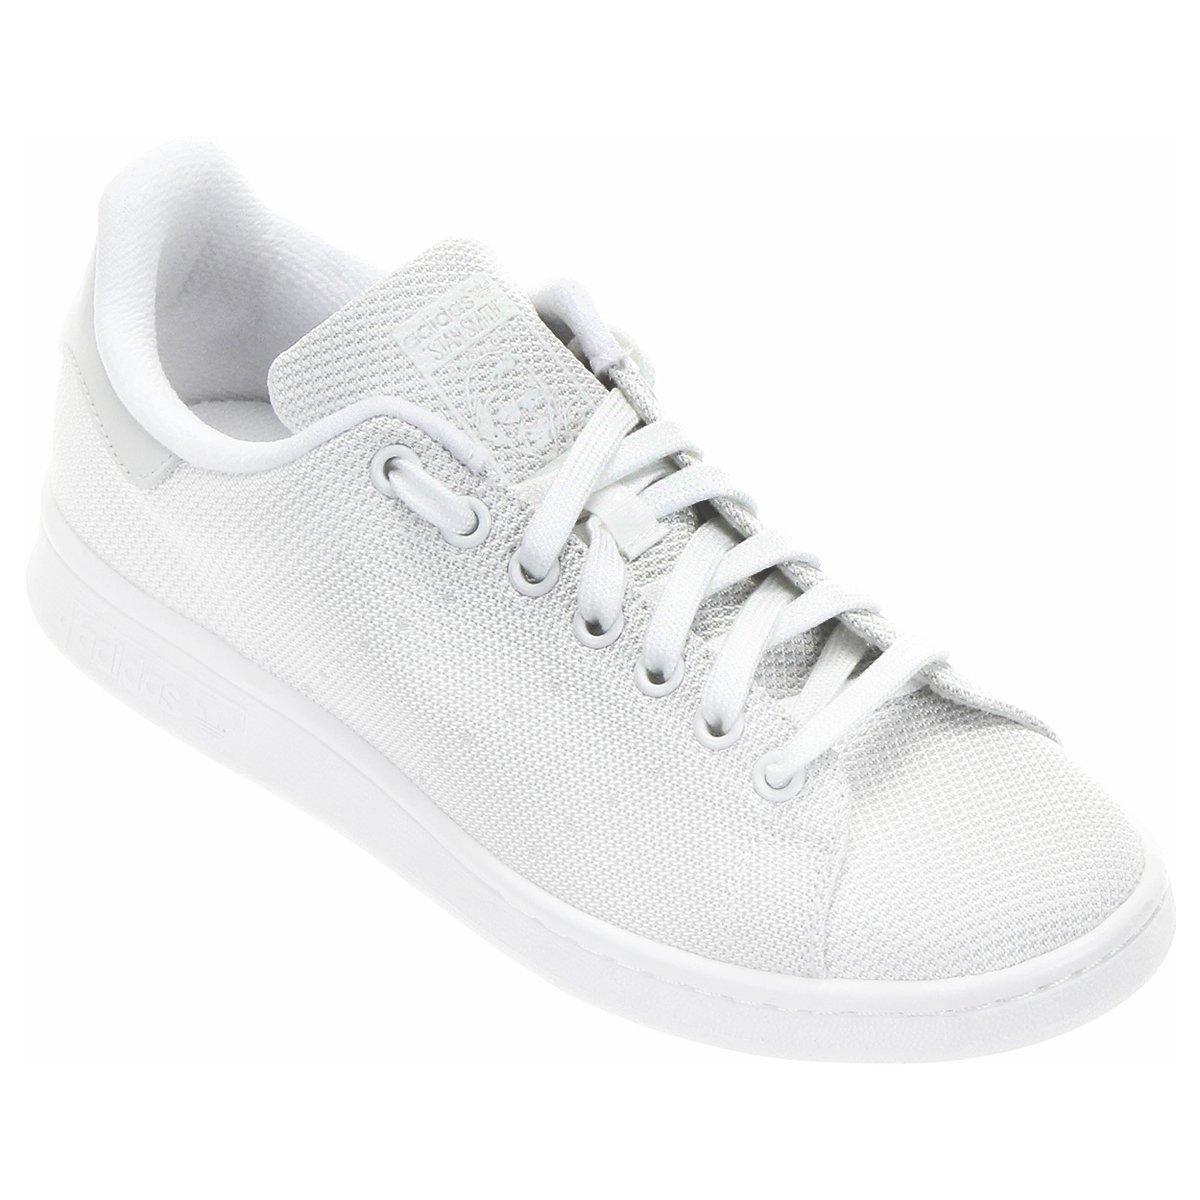 4338a1dbabb Tênis Adidas Stan Smith Weave - Compre Agora